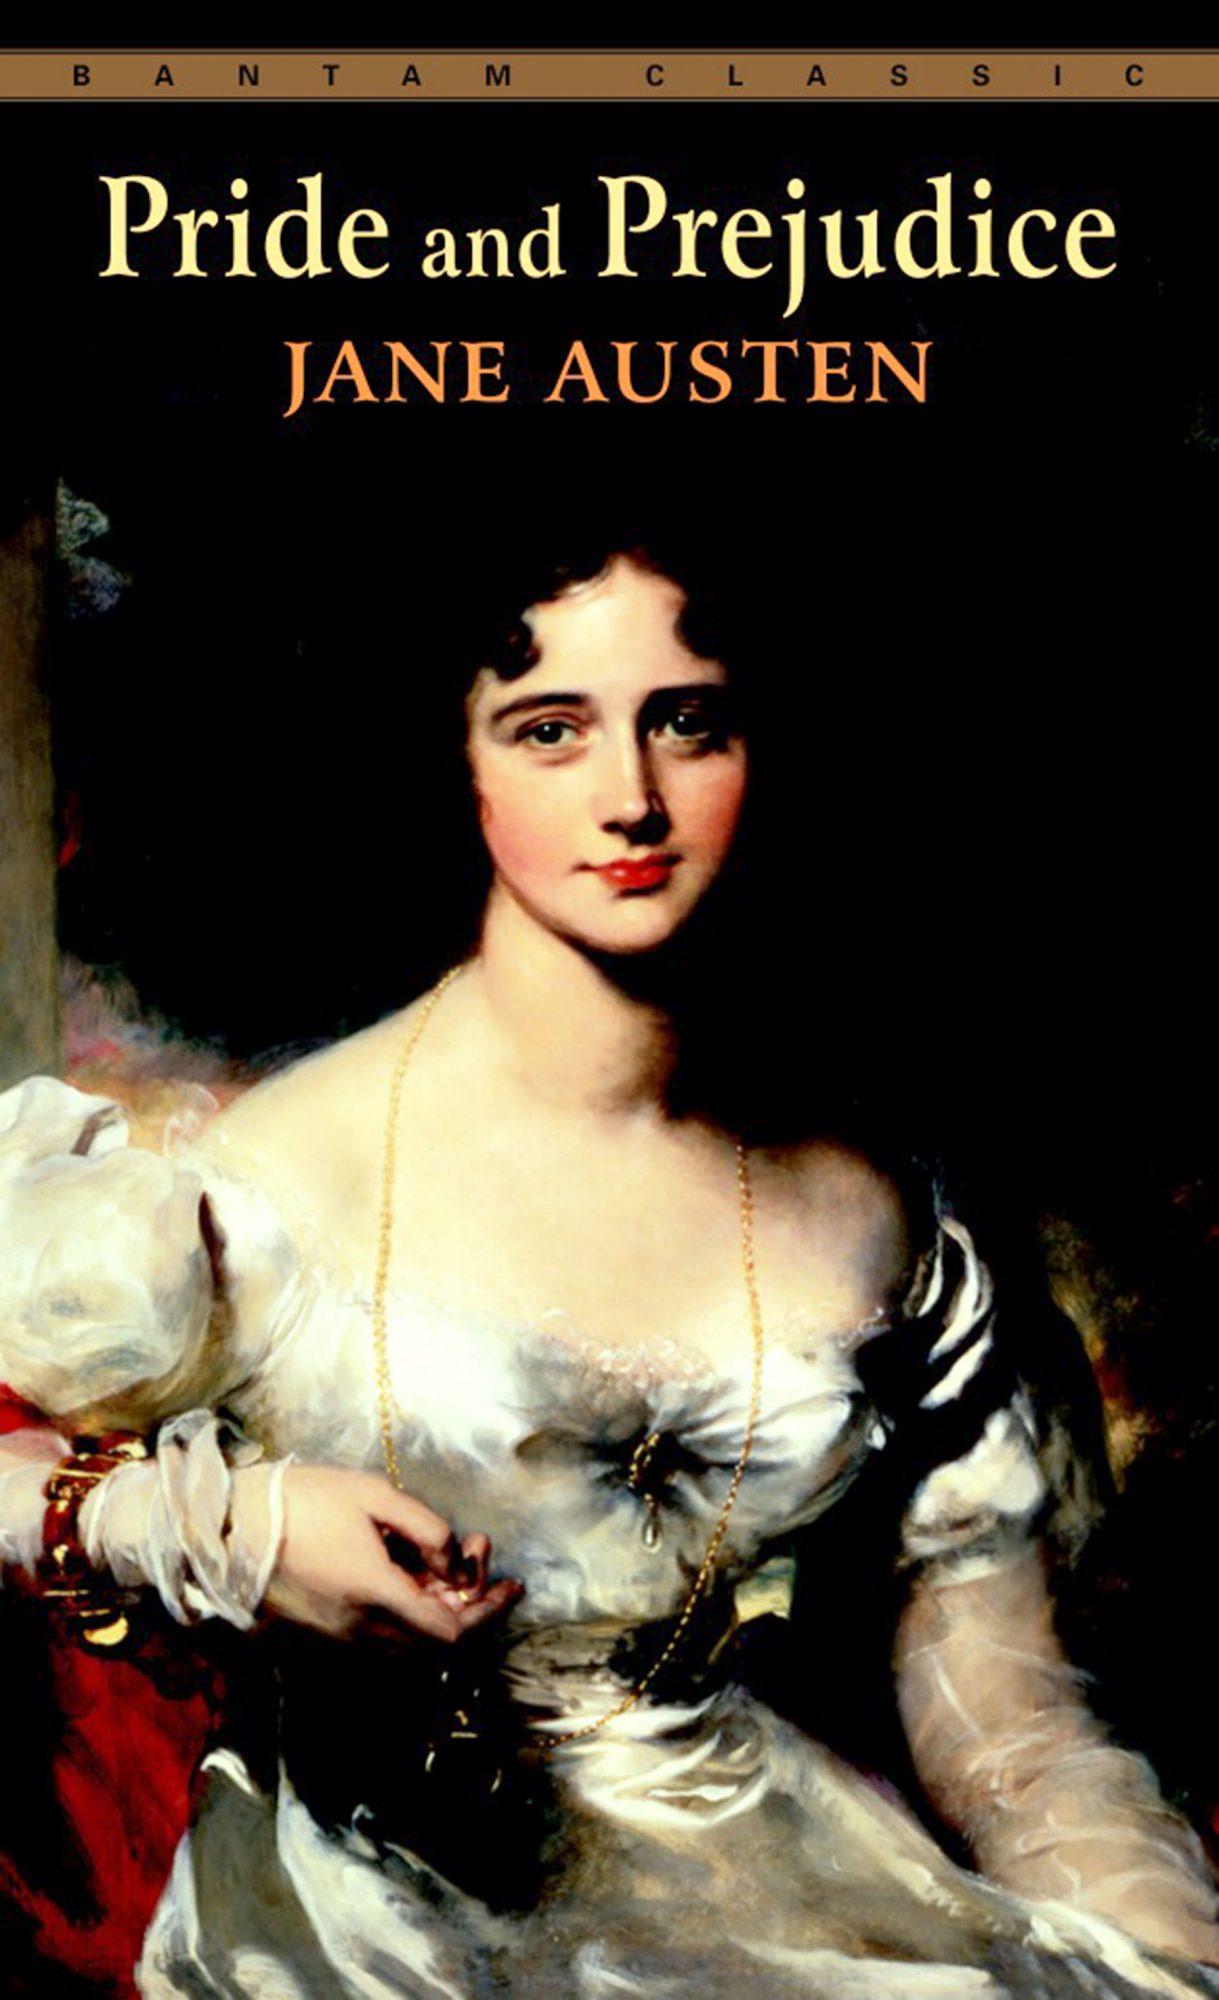 Pride and Prejudice - paperback (Edition 12/01/83)by Jane Austen